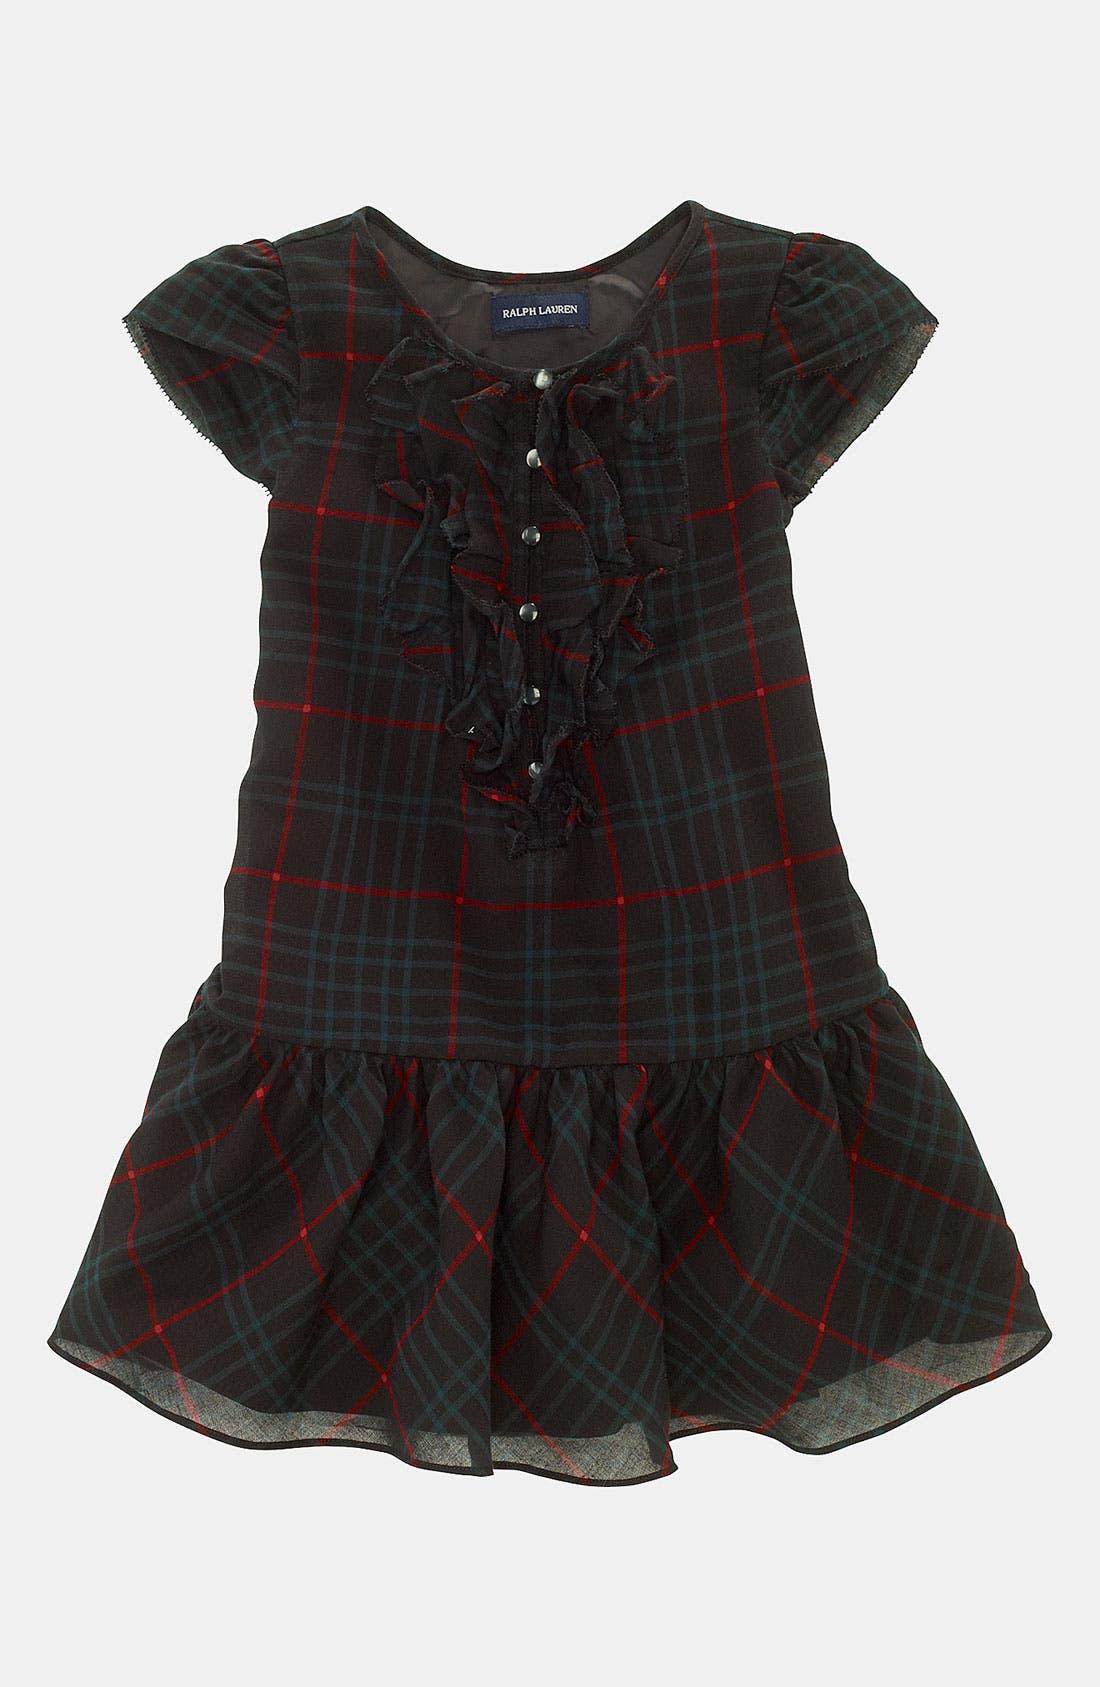 Main Image - Ralph Lauren Plaid Dress (Toddler)